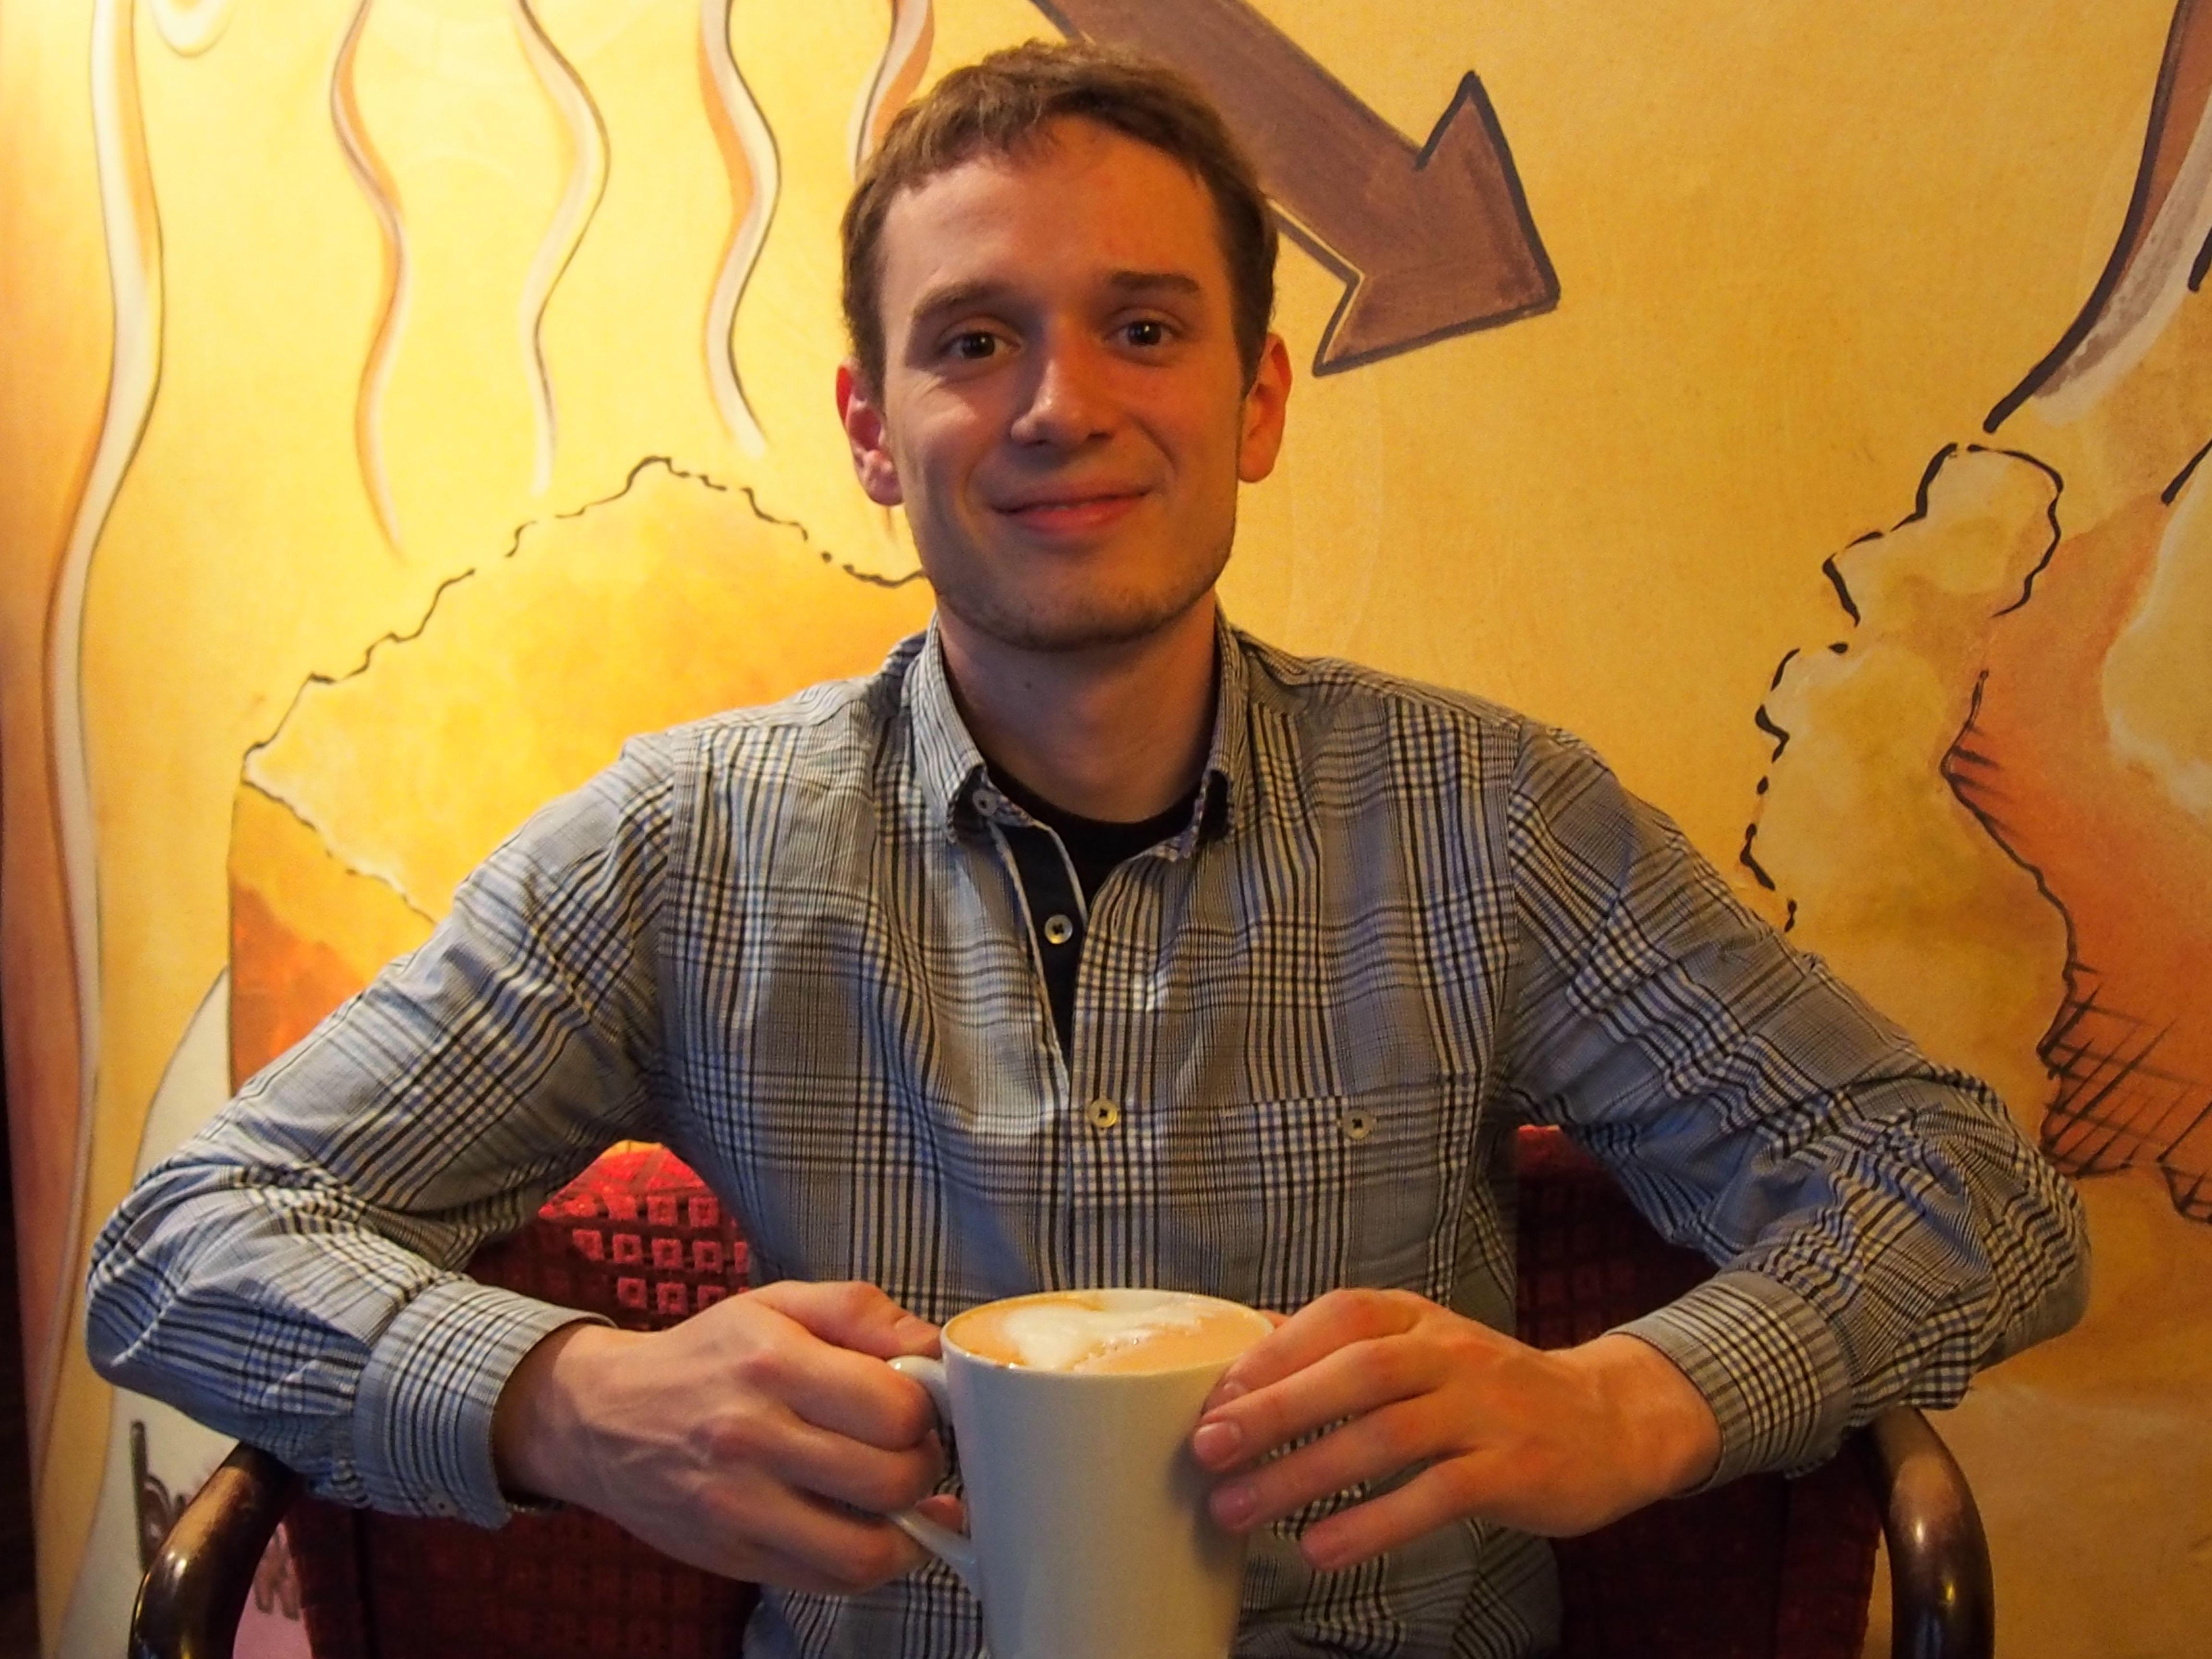 Heiko butz, Gründer Kowach bei LEINENLOS